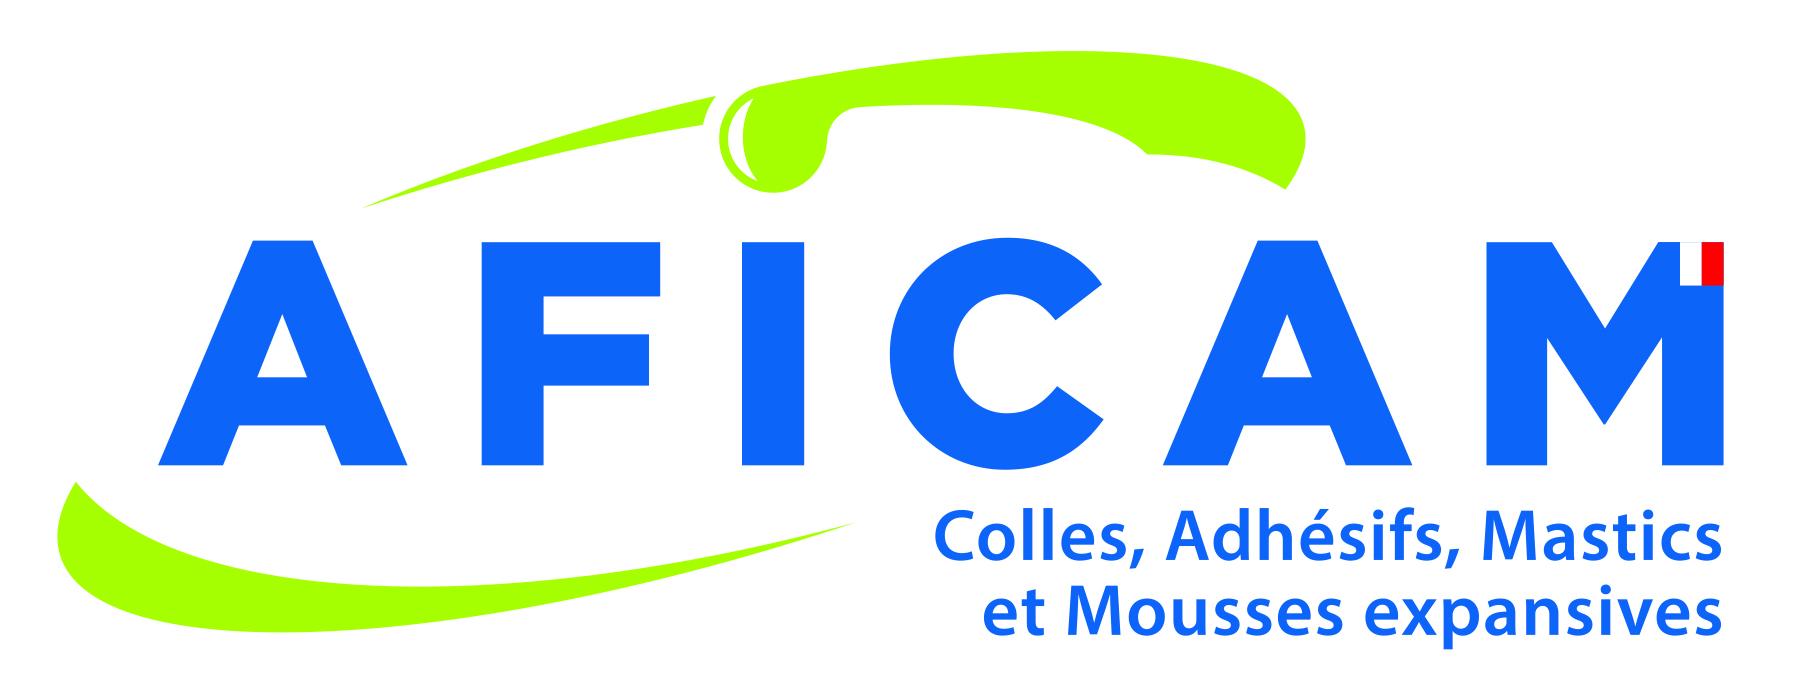 AFICAM logo